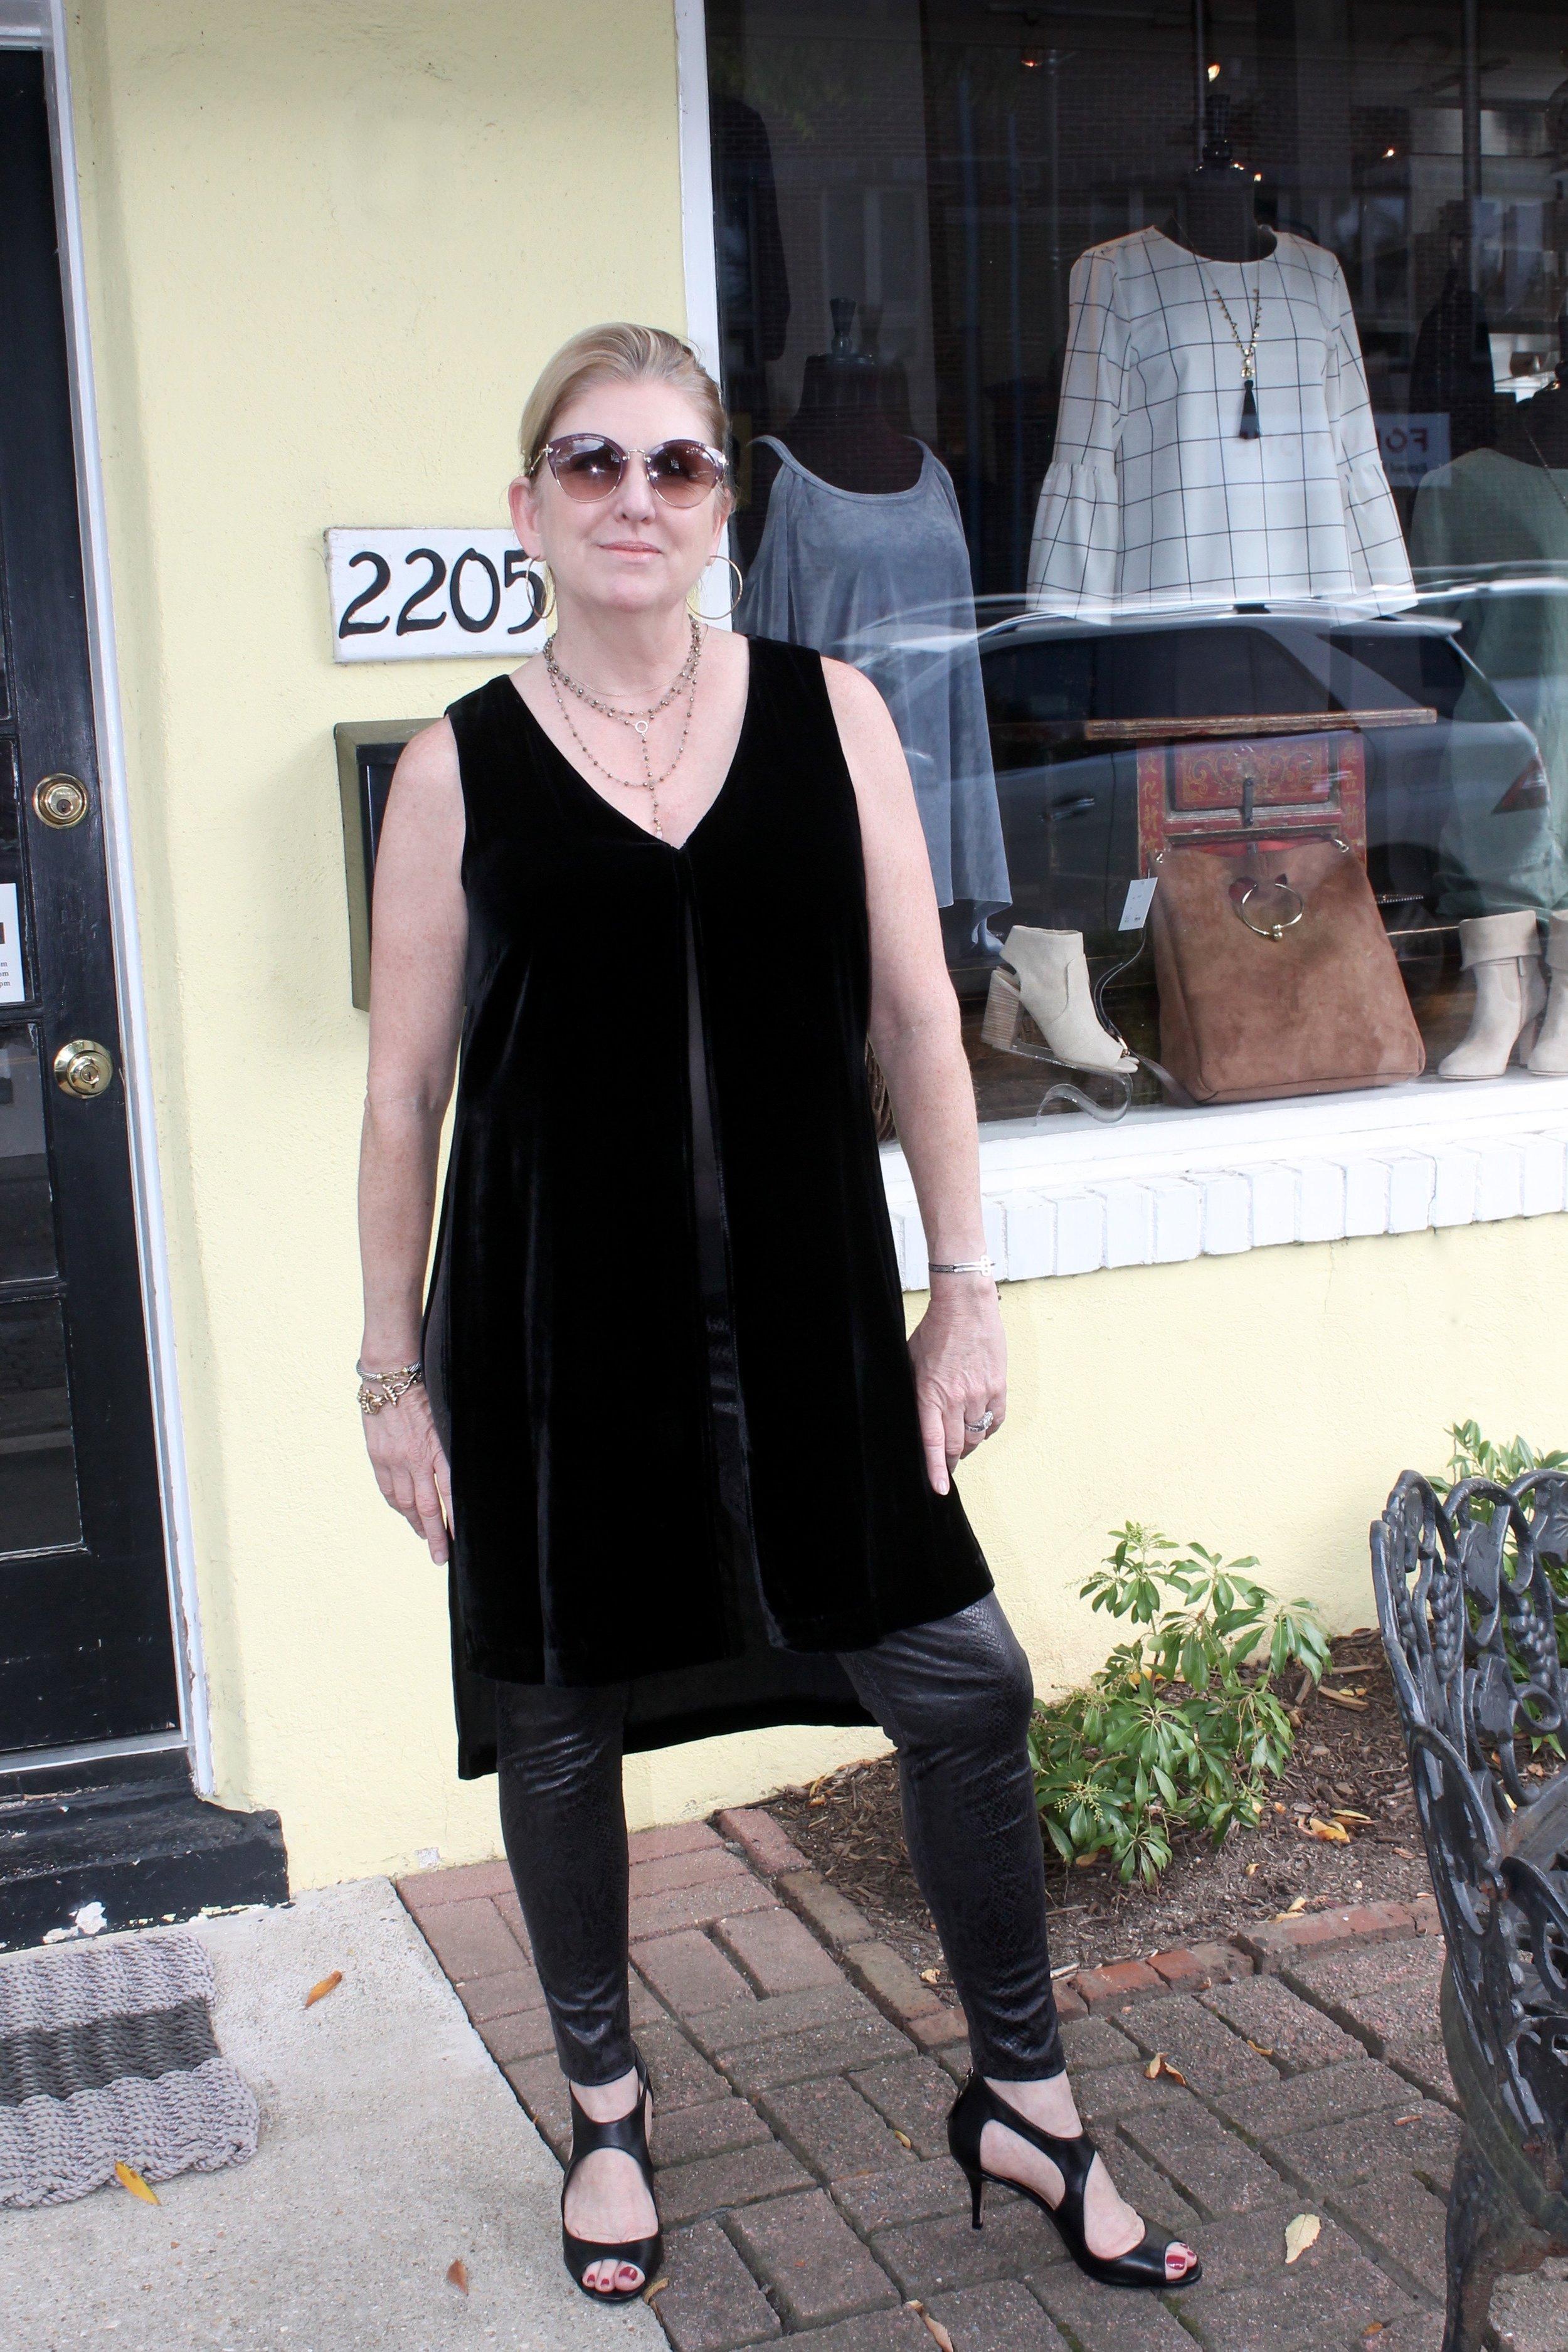 velvet_top_leatherpants.jpg